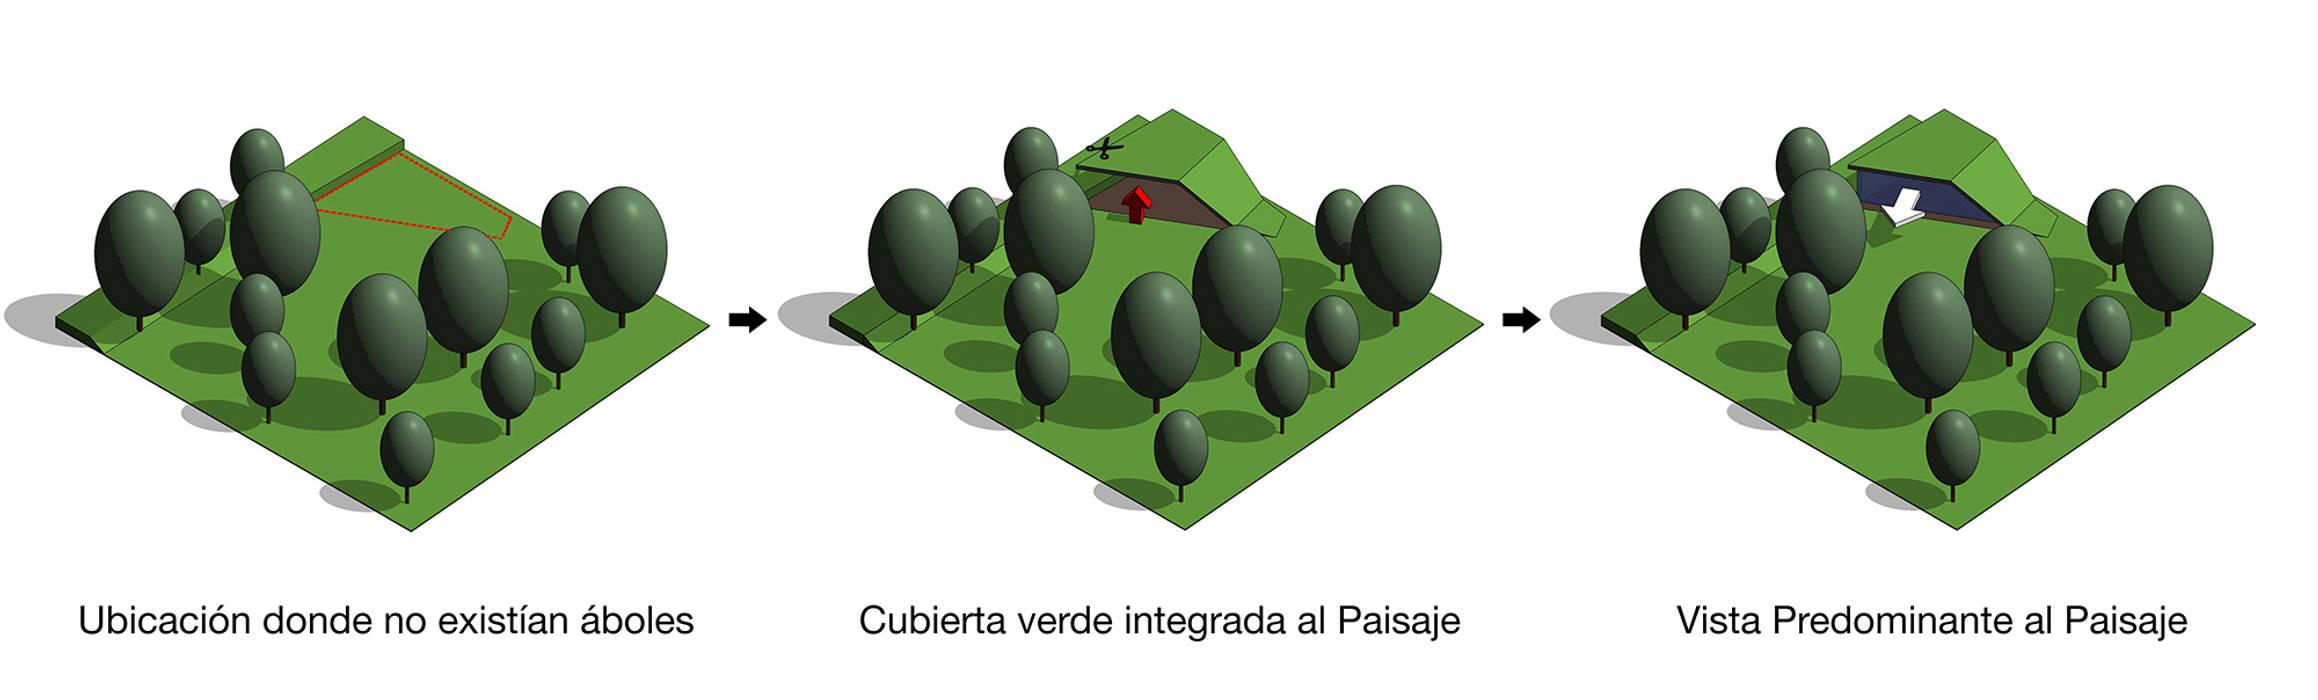 Cubierta verde Integrada de sanzpont [arquitectura] Moderno